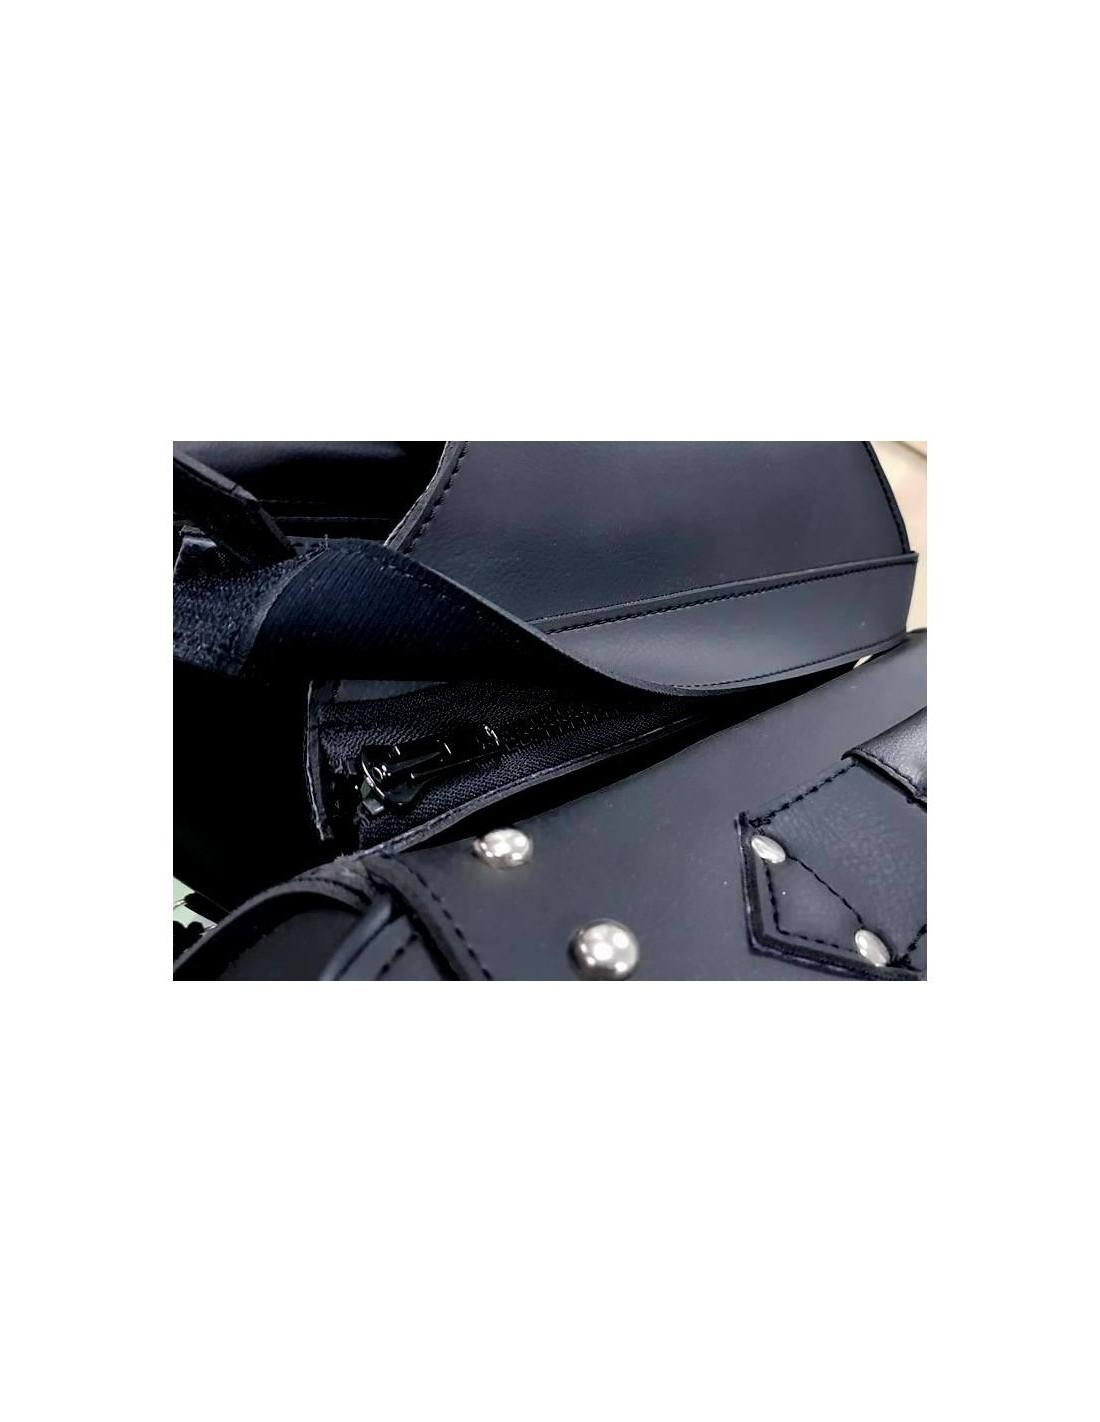 3b13177d4f7 Alforjas moto de cuero para moto custom